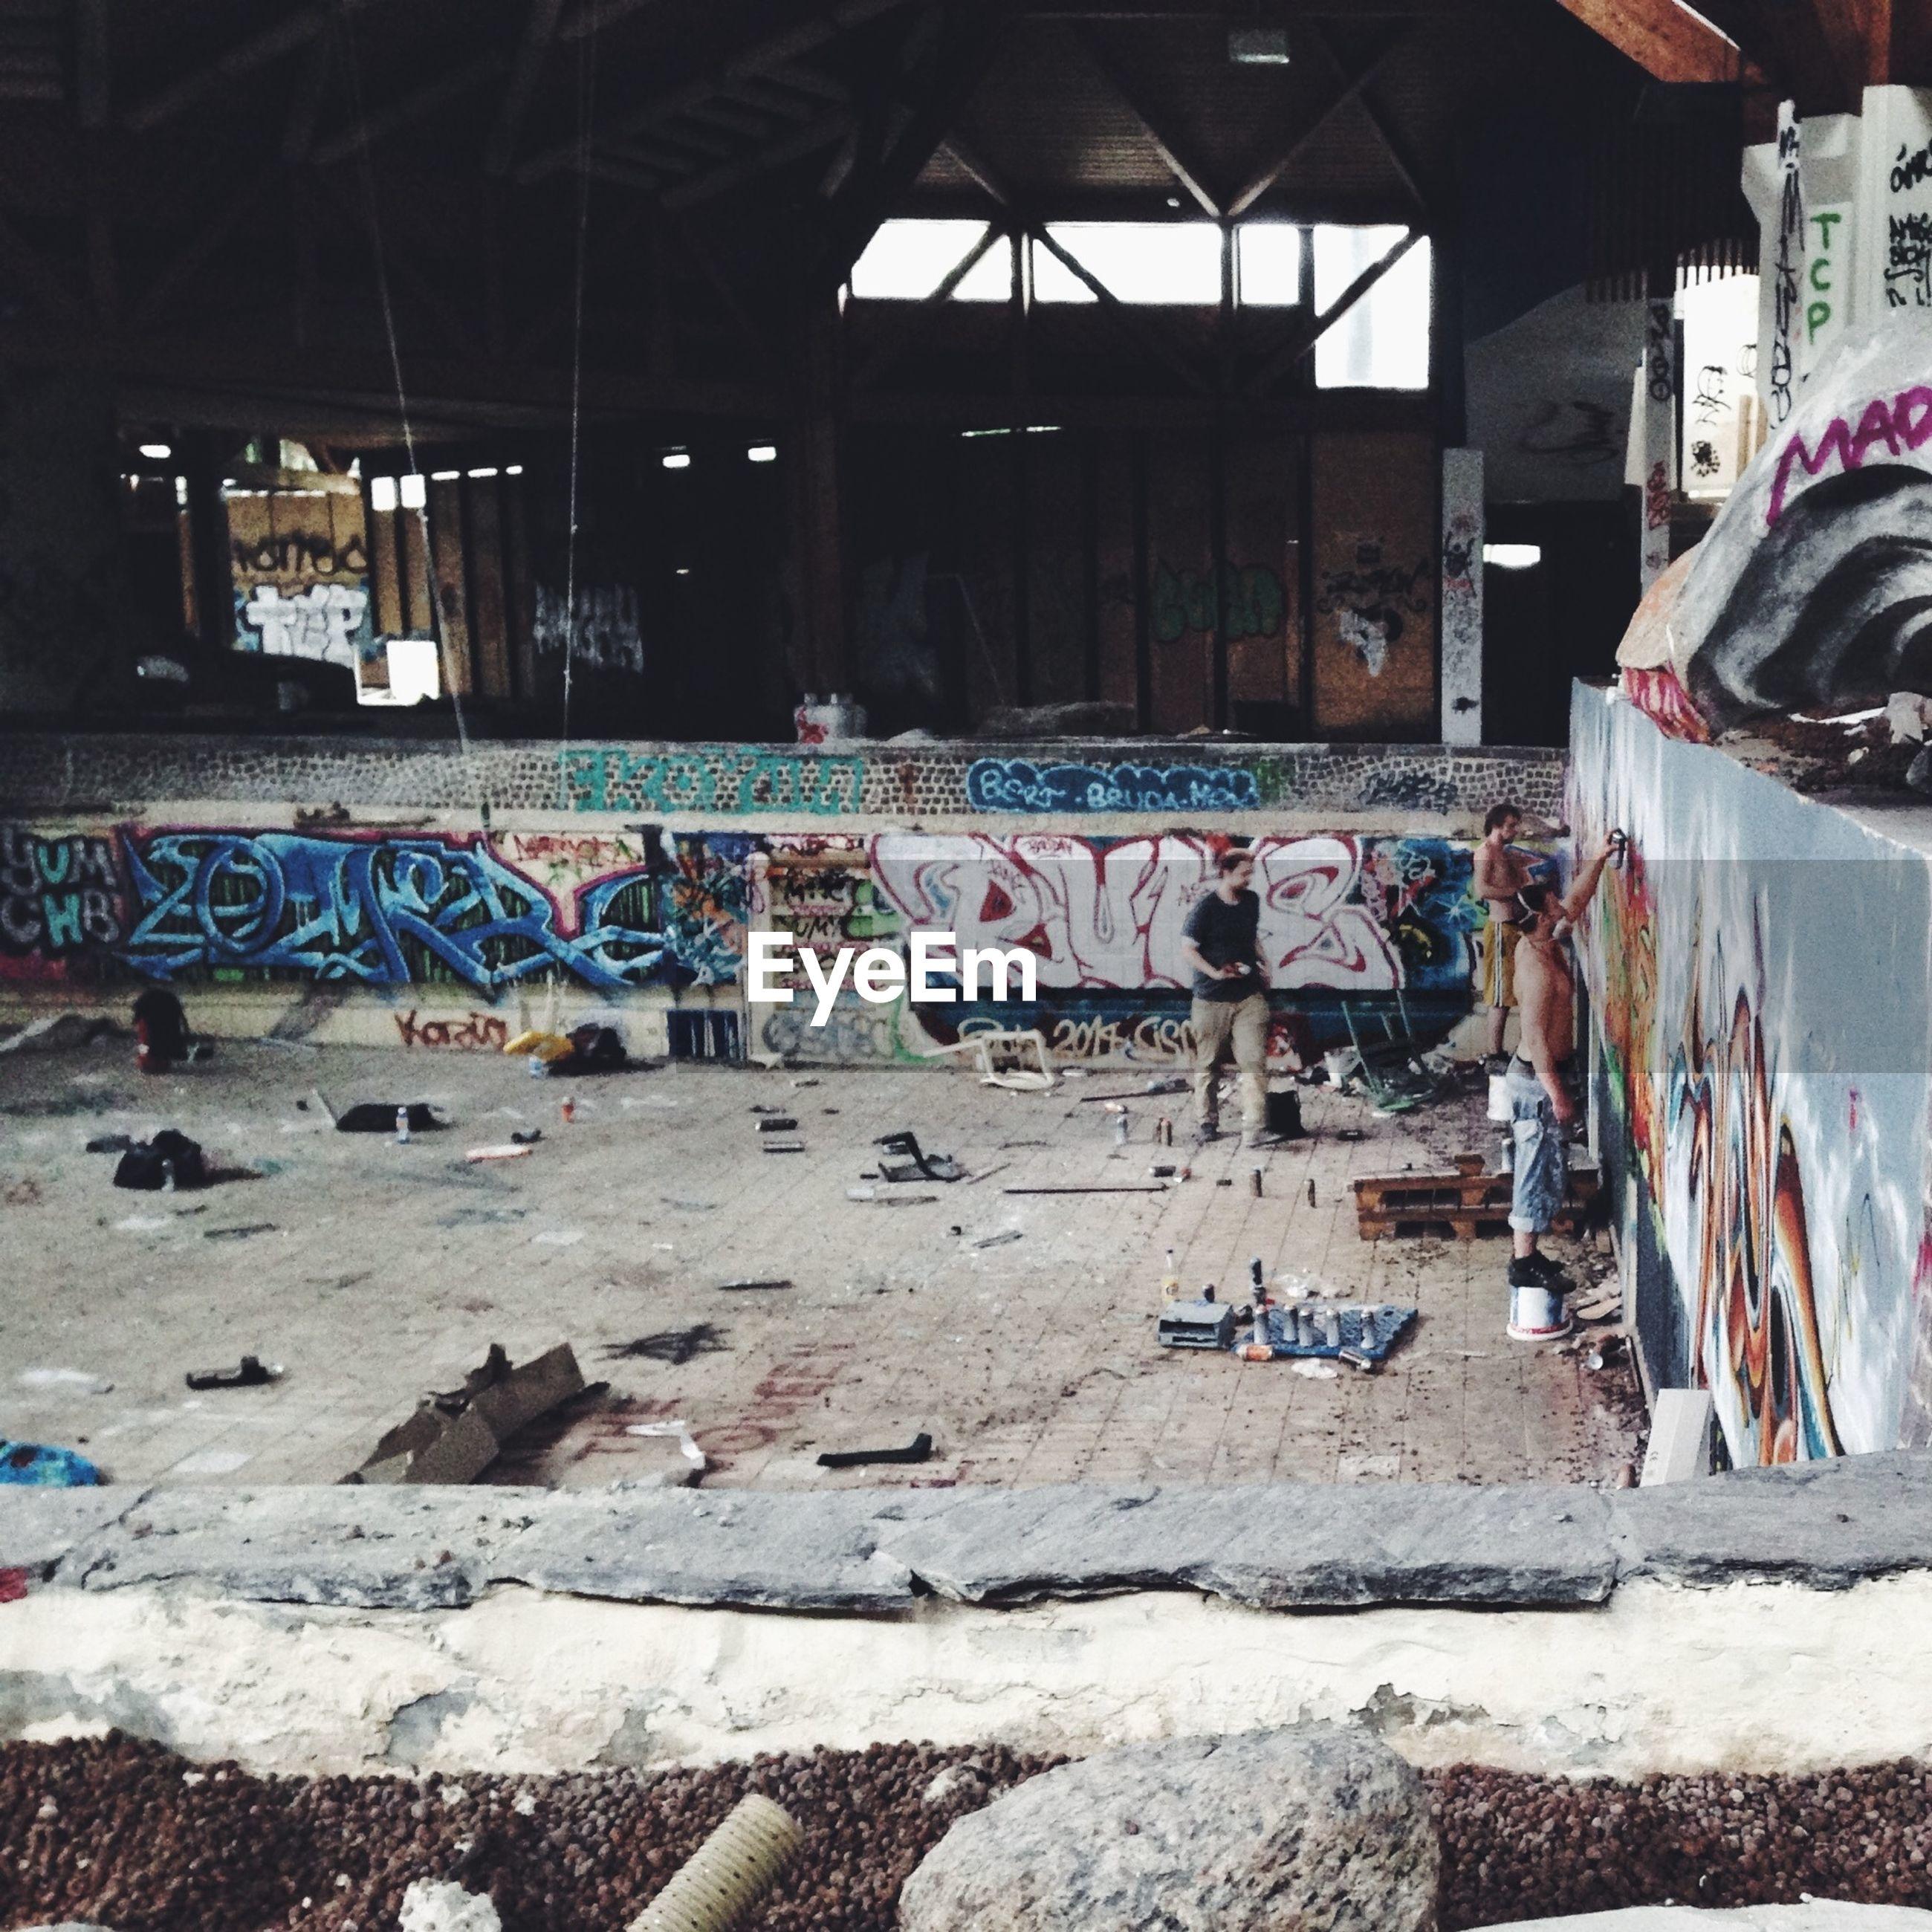 Men painting graffiti in abandoned building